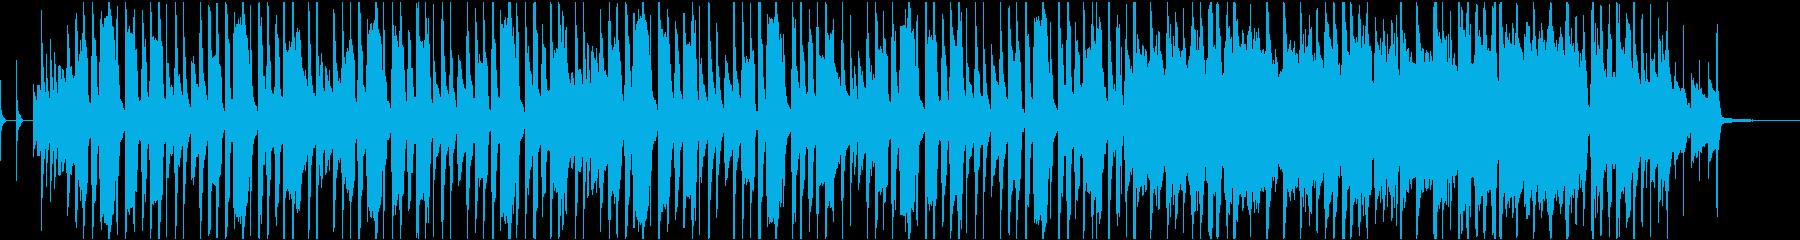 CMや映像用の楽しいトランペットの曲の再生済みの波形